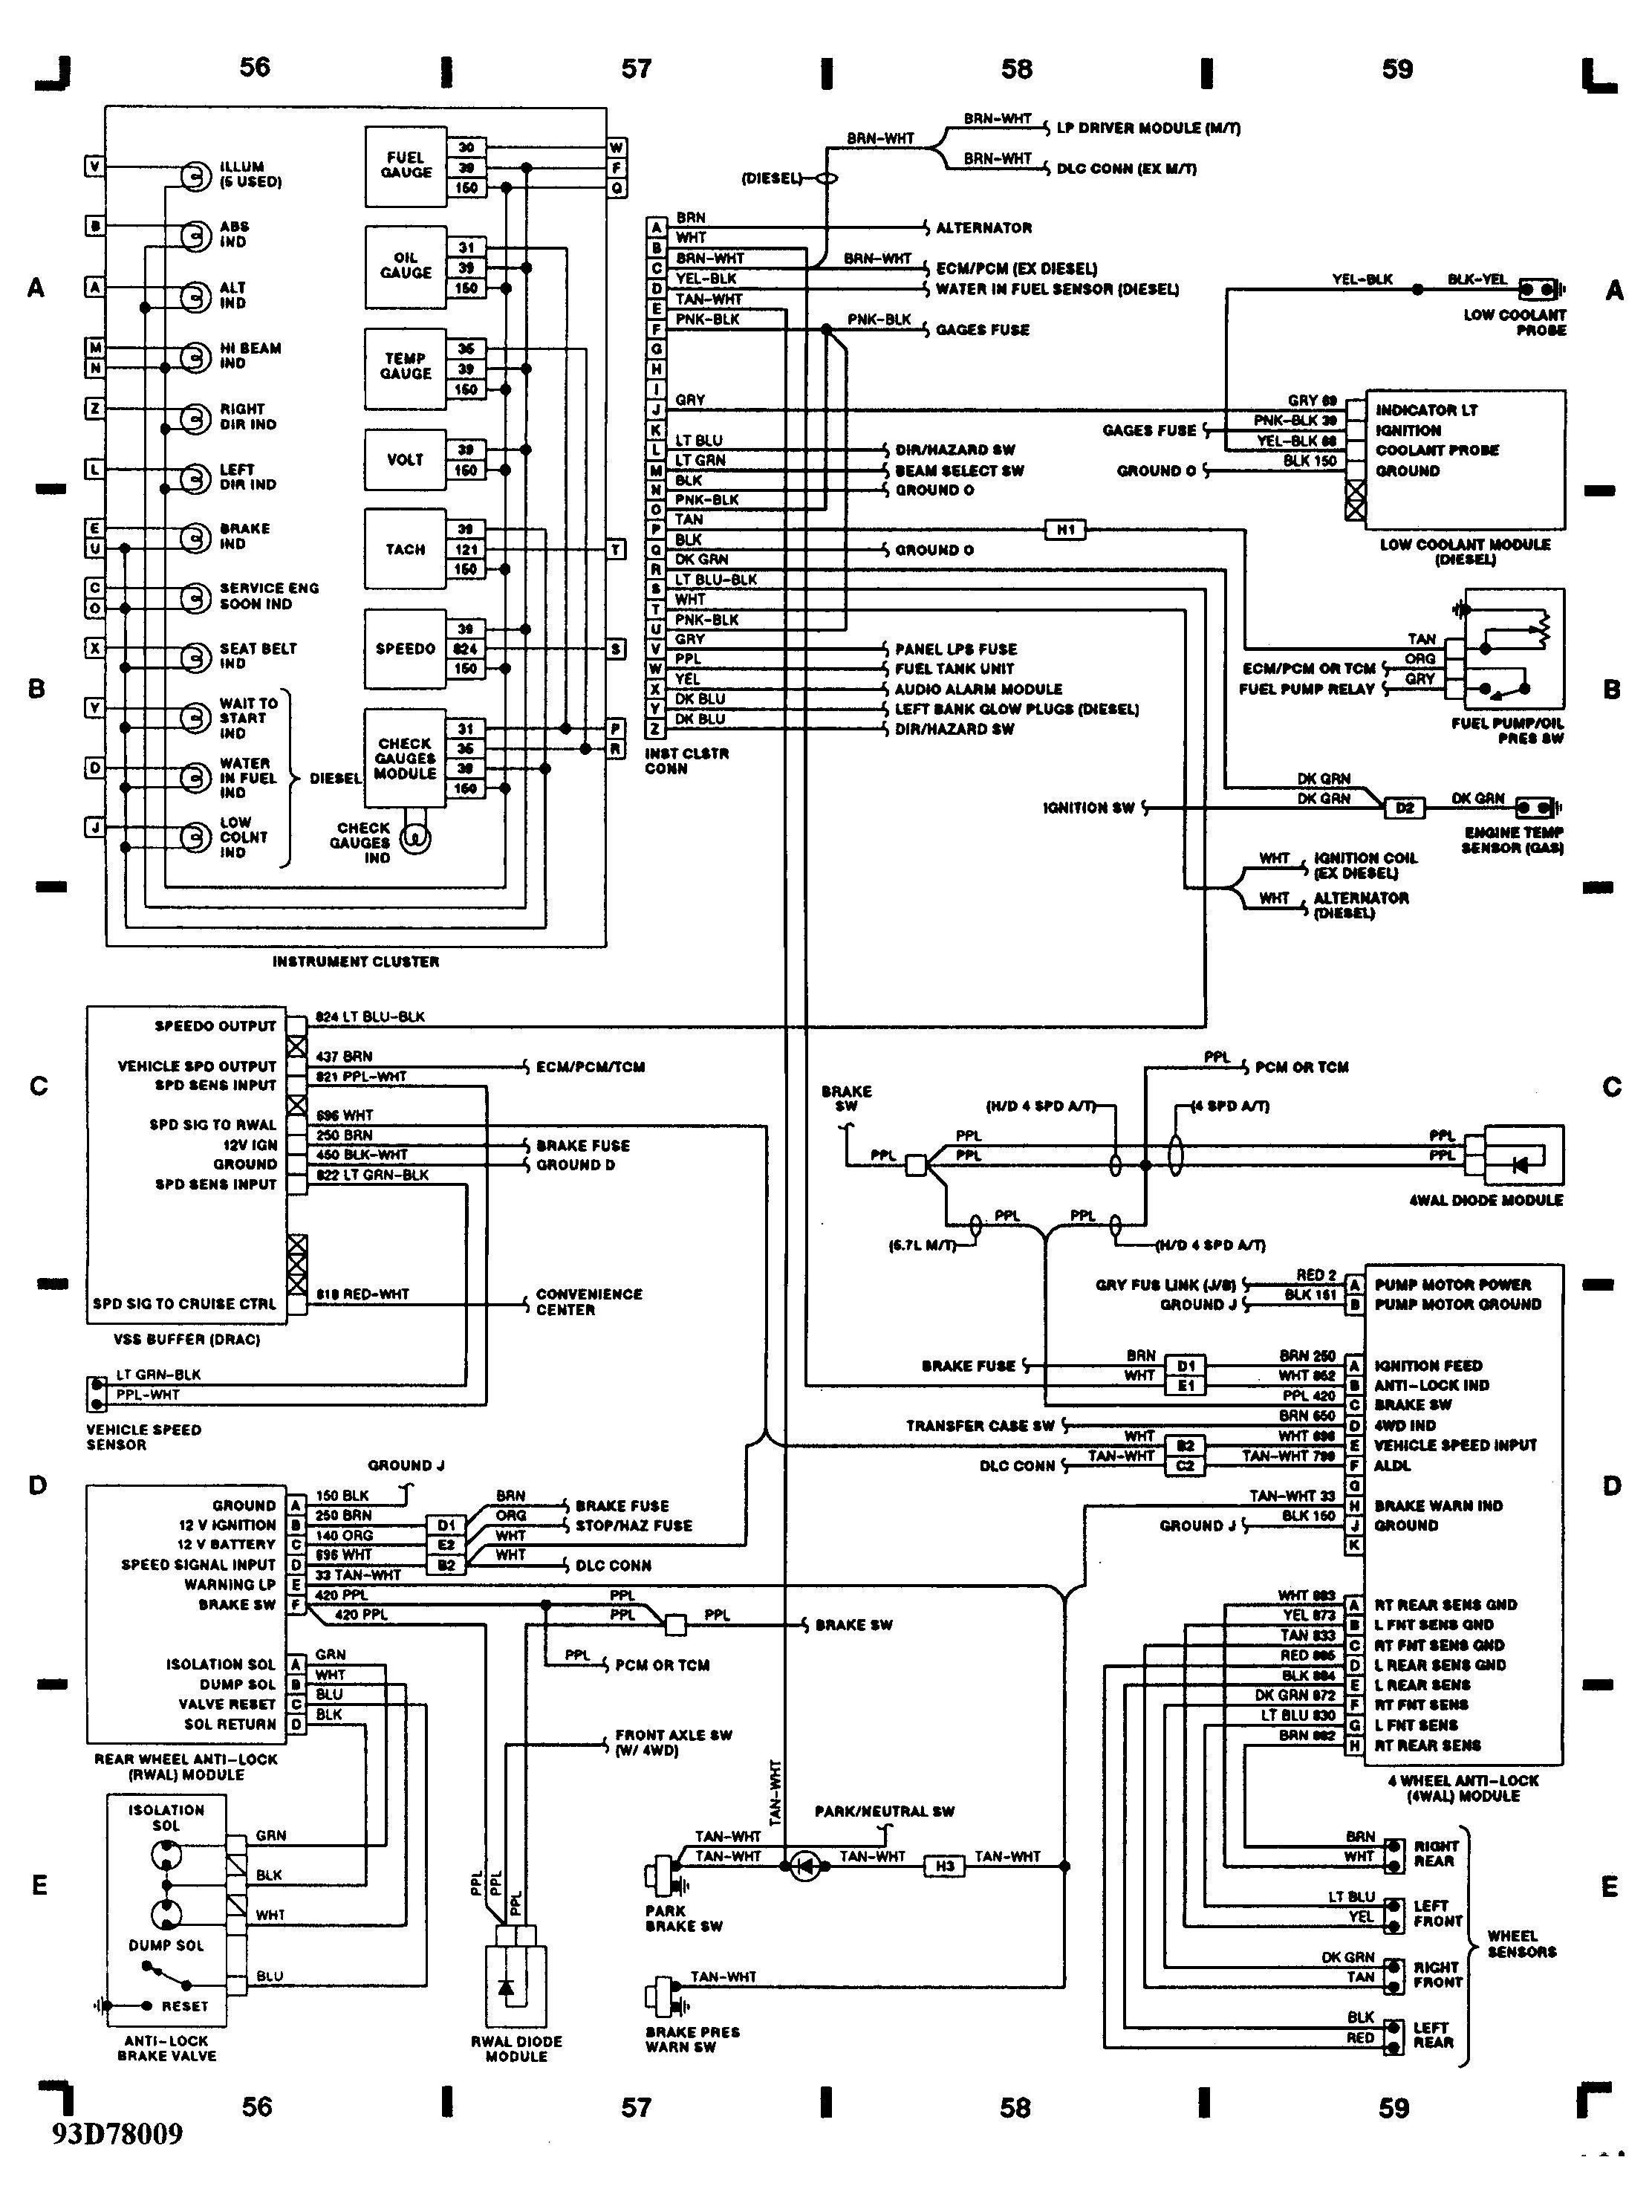 Dodge Hemi 5 7 Engine Diagram 2008 Dodge Ram Trailer Wiring ... on